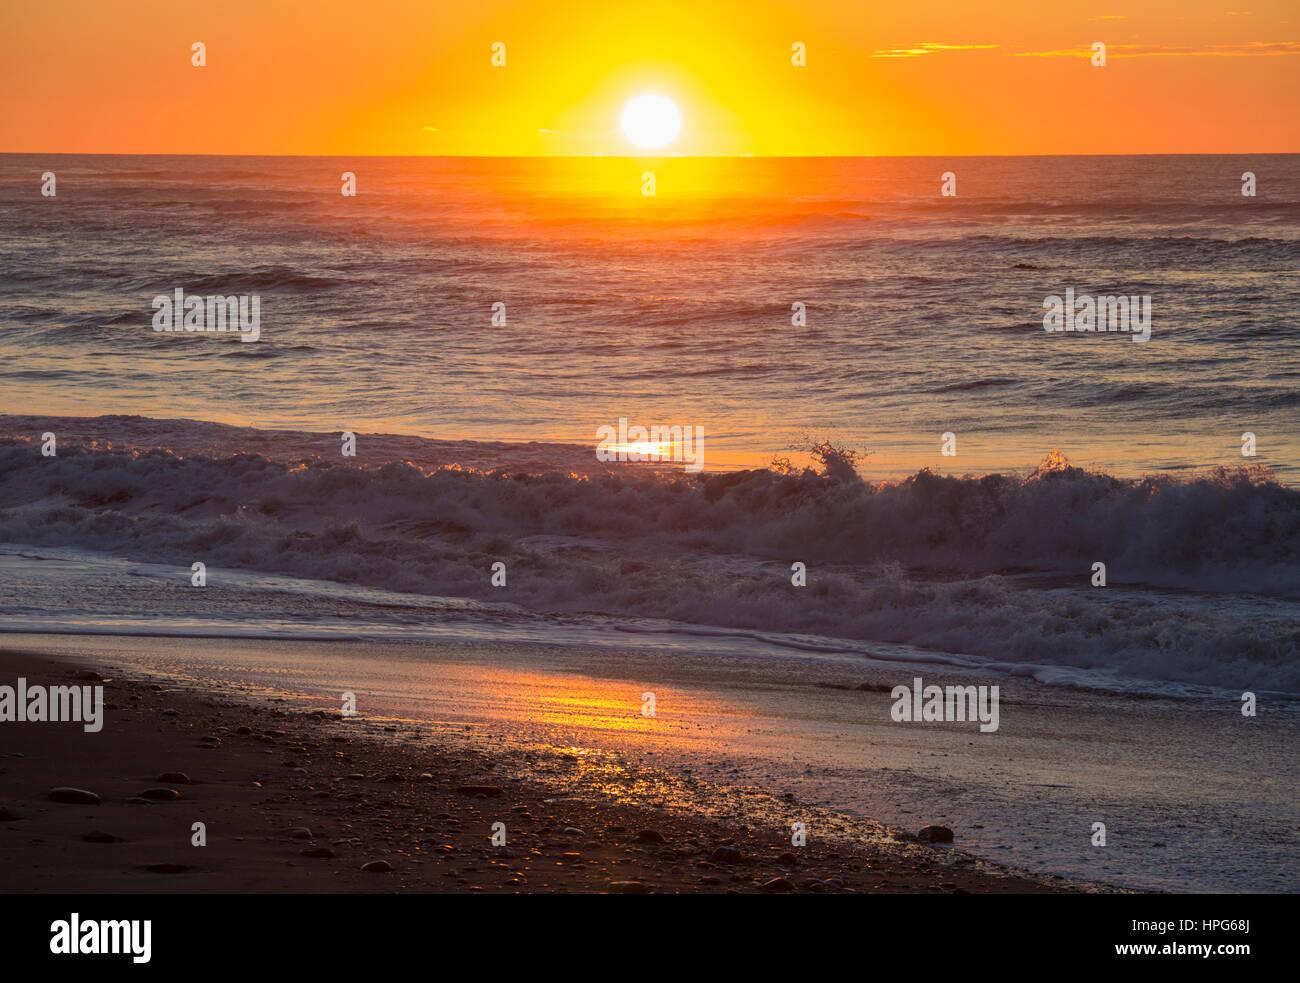 Okarito, Westland Tai Poutini National Park, West Coast, New Zealand. Golden sunset over the Tasman Sea. Stock Photo